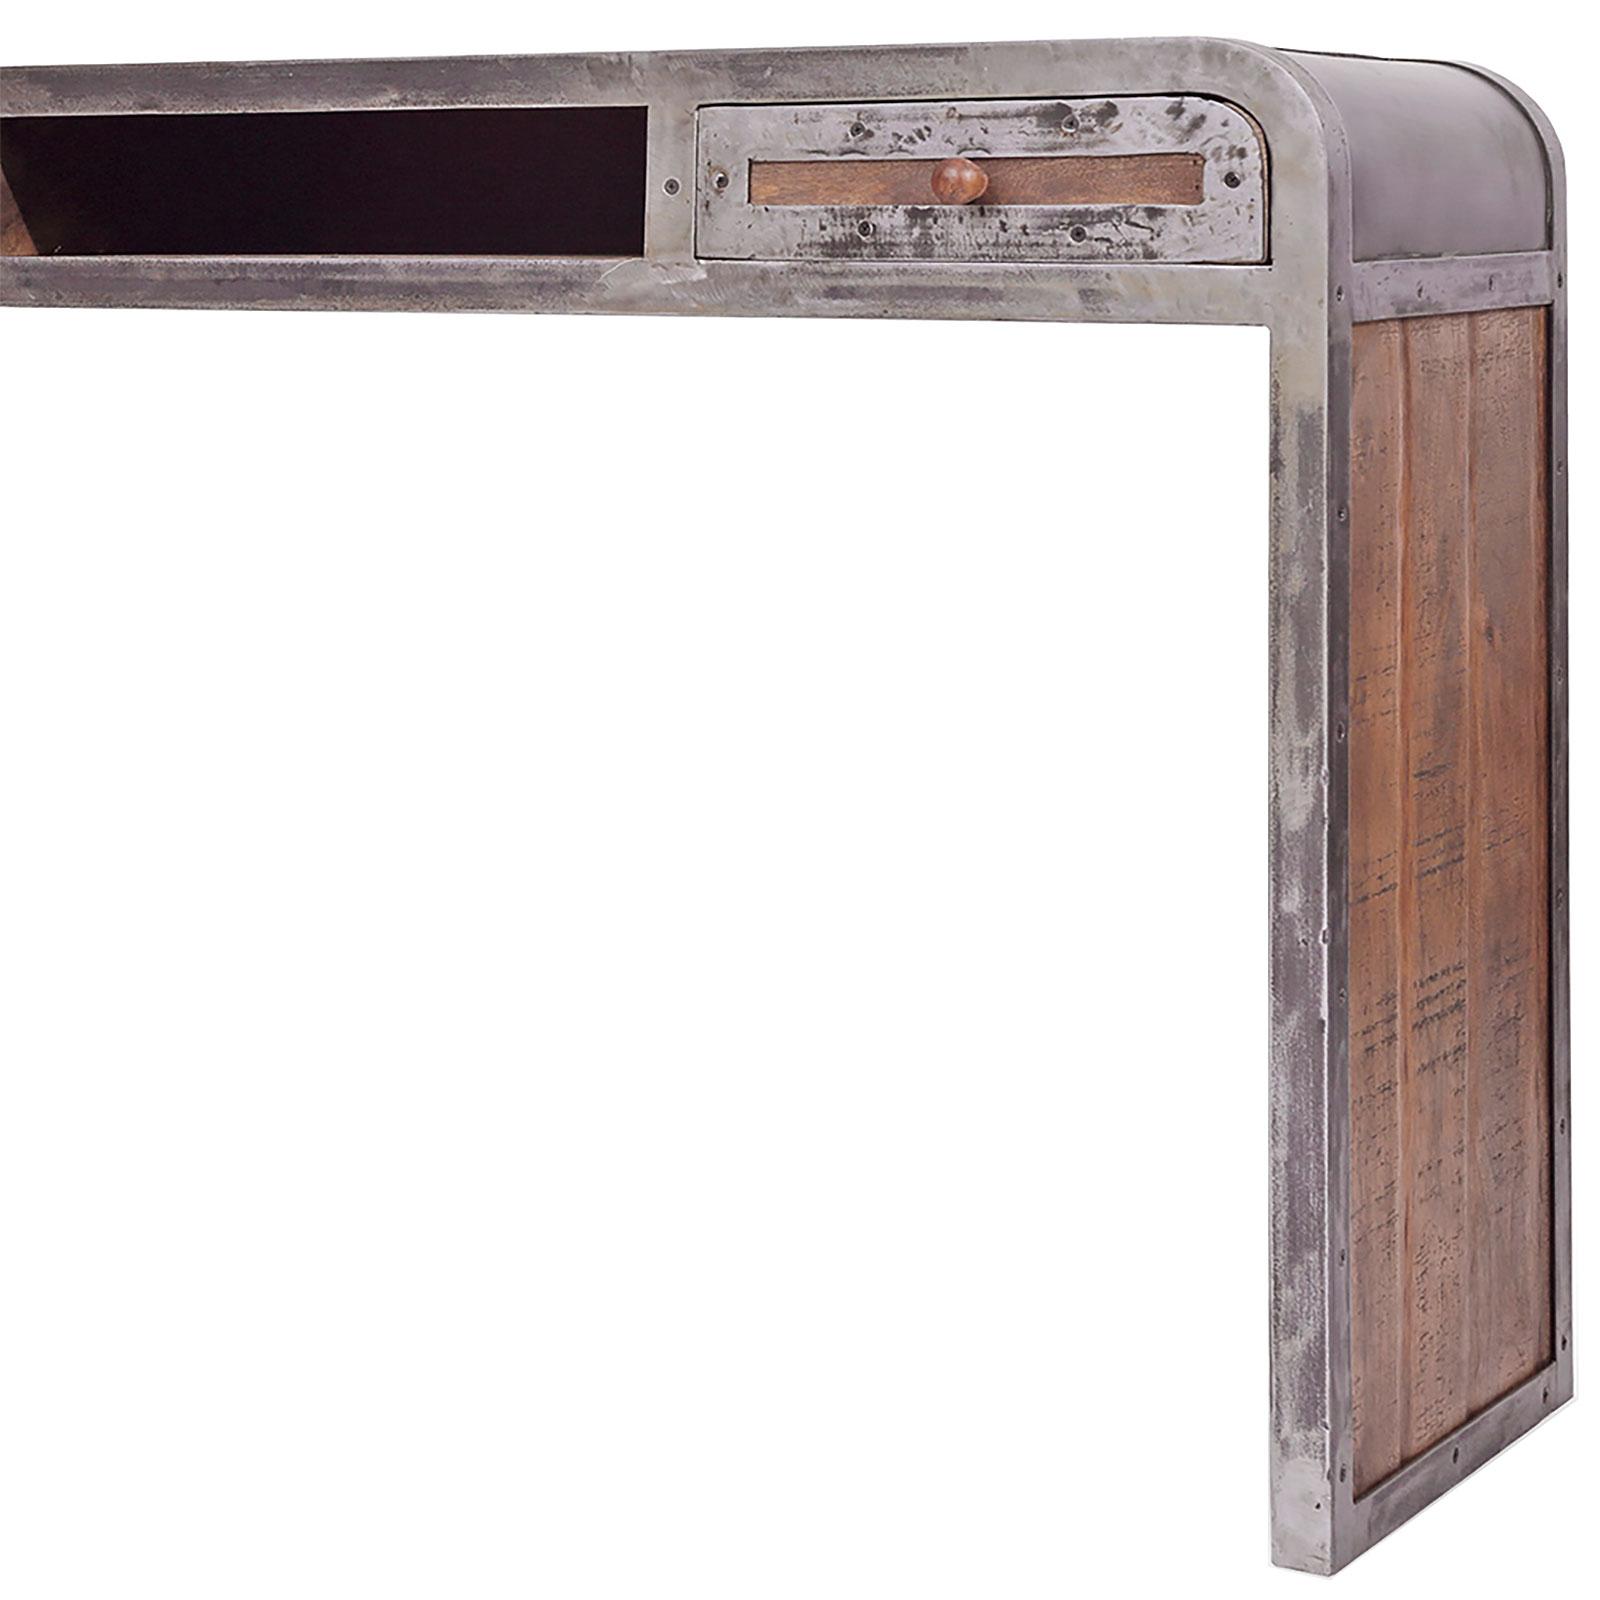 konsole saigon aus mangoholz und metall 120 x 80 cm. Black Bedroom Furniture Sets. Home Design Ideas